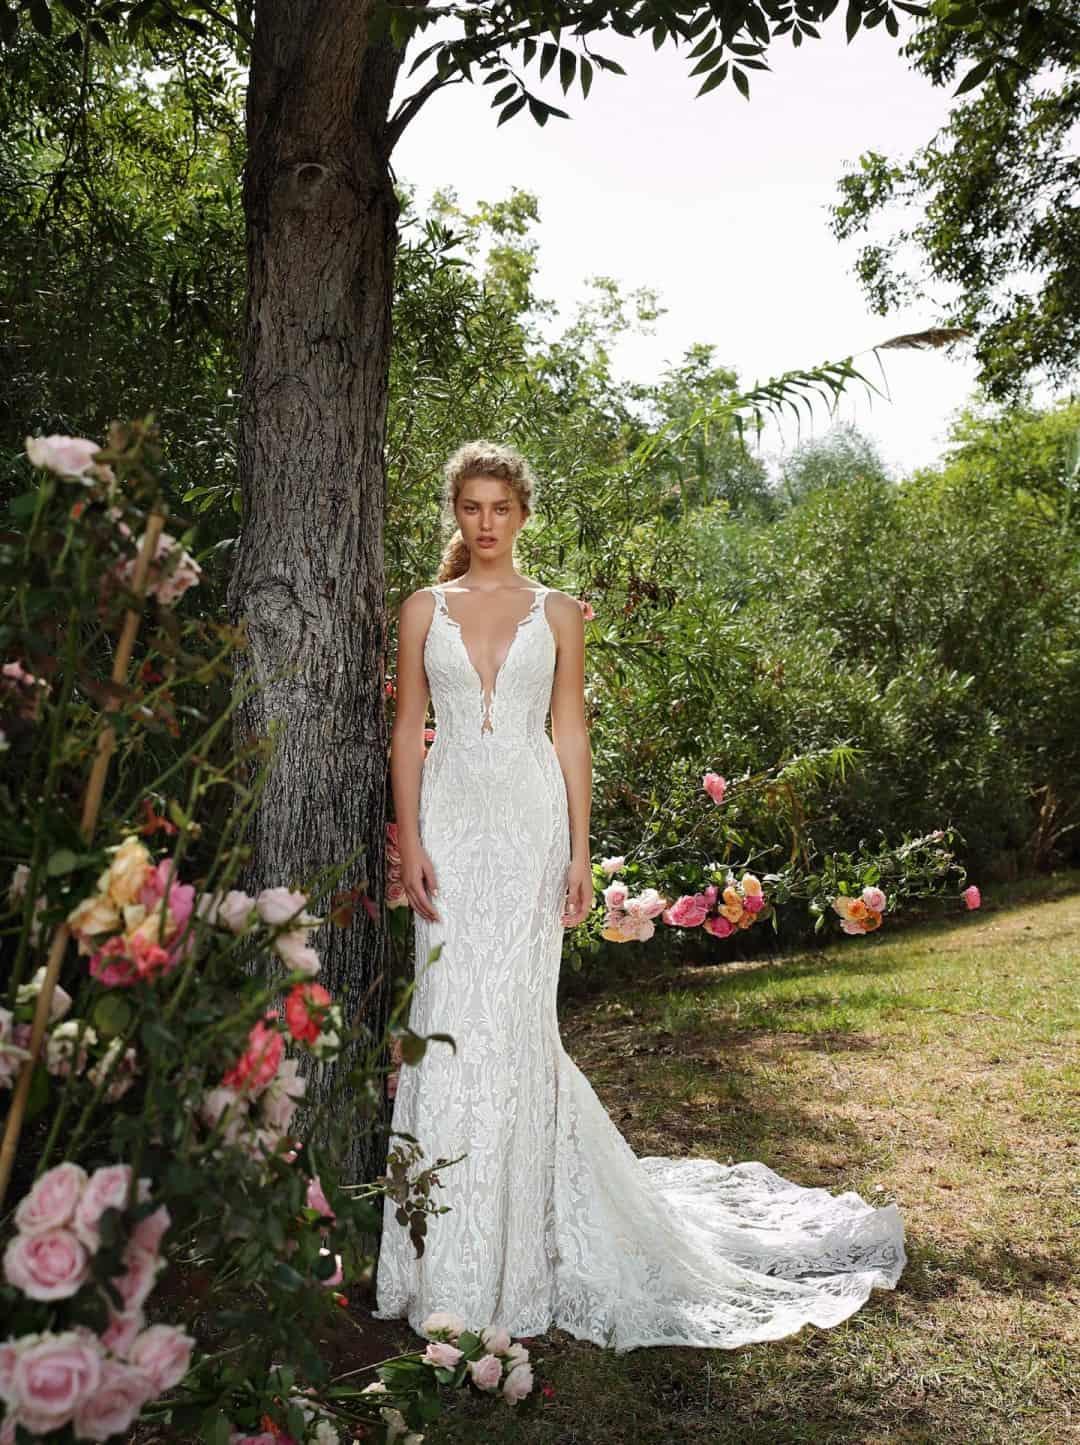 Haute Couture Wedding Dresses - G-207-front-long